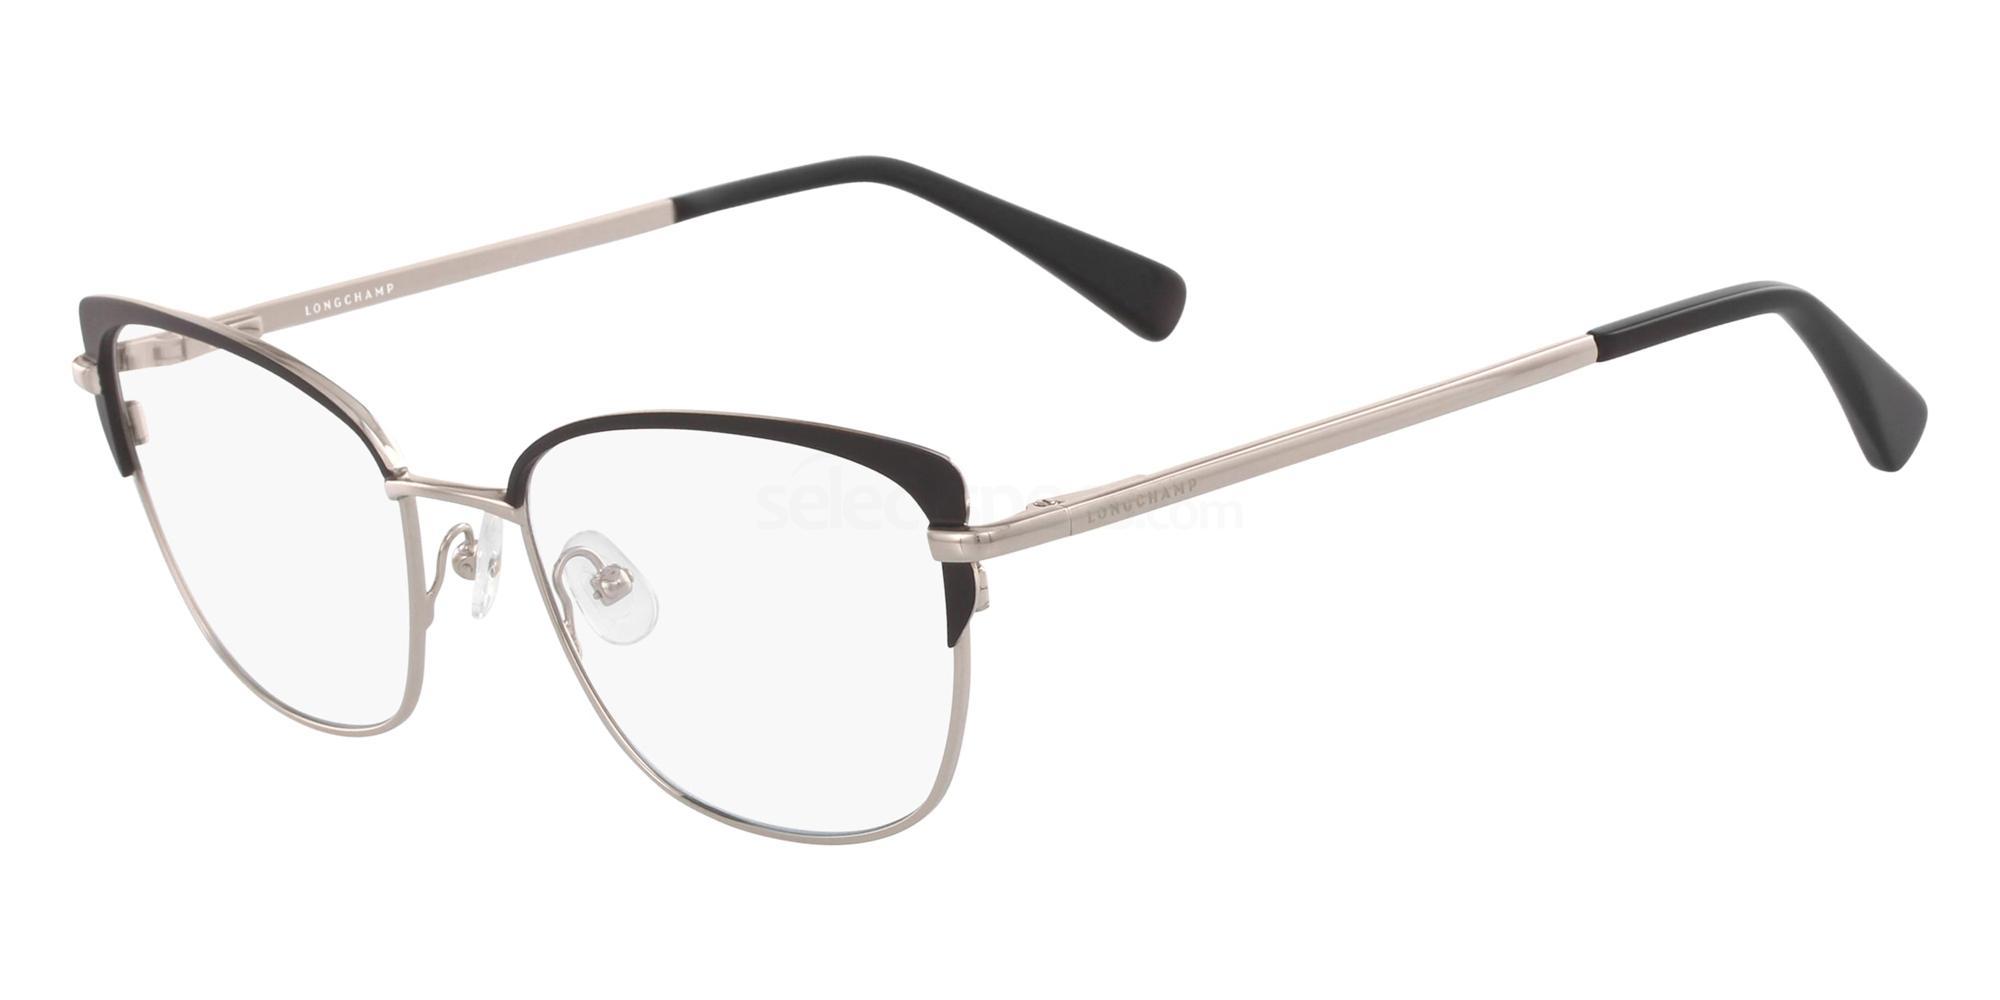 001 LO2108 Glasses, LONGCHAMP